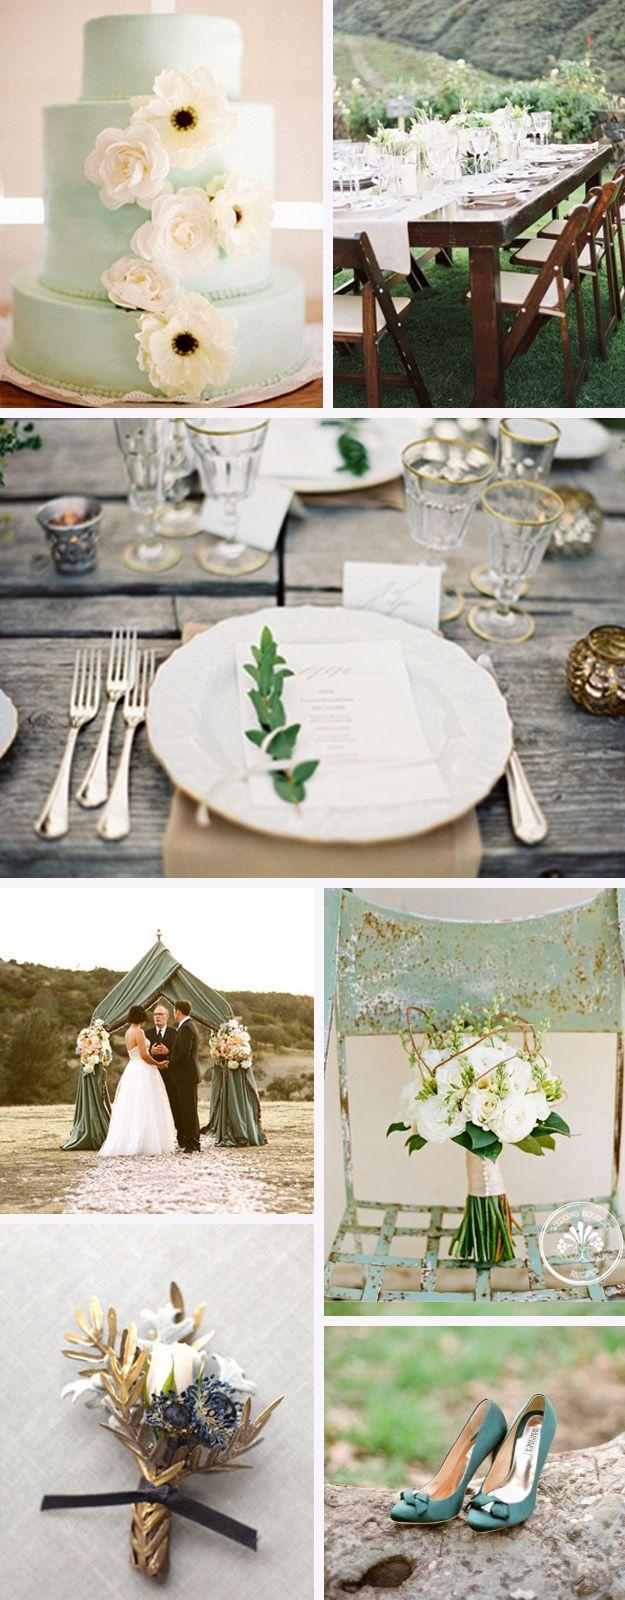 33 best Green Wedding Inspirations images on Pinterest   Green ...